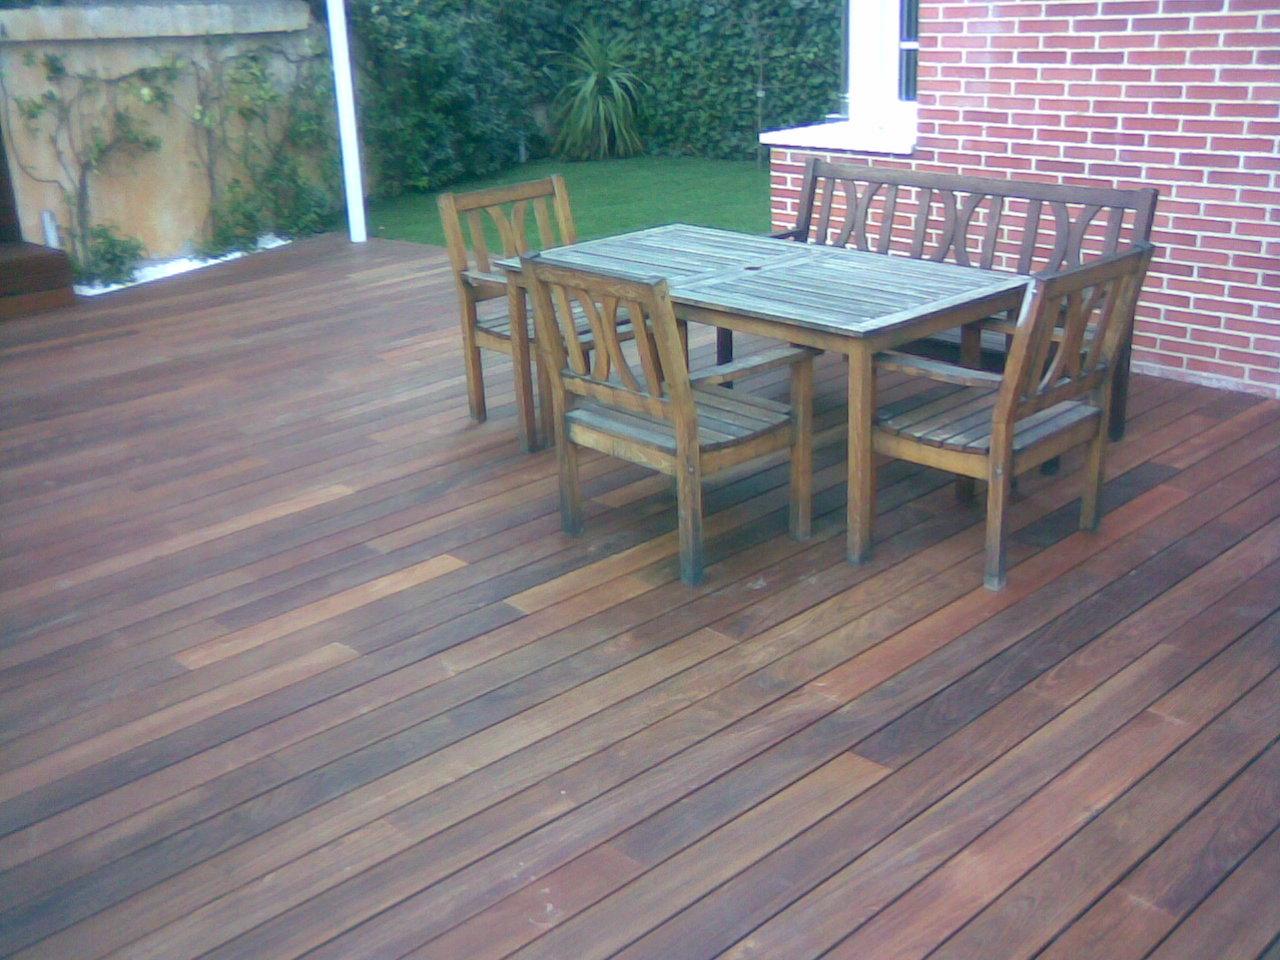 Venta de tarima de ipe exterior para jardin en madrid for Ipe madera exterior